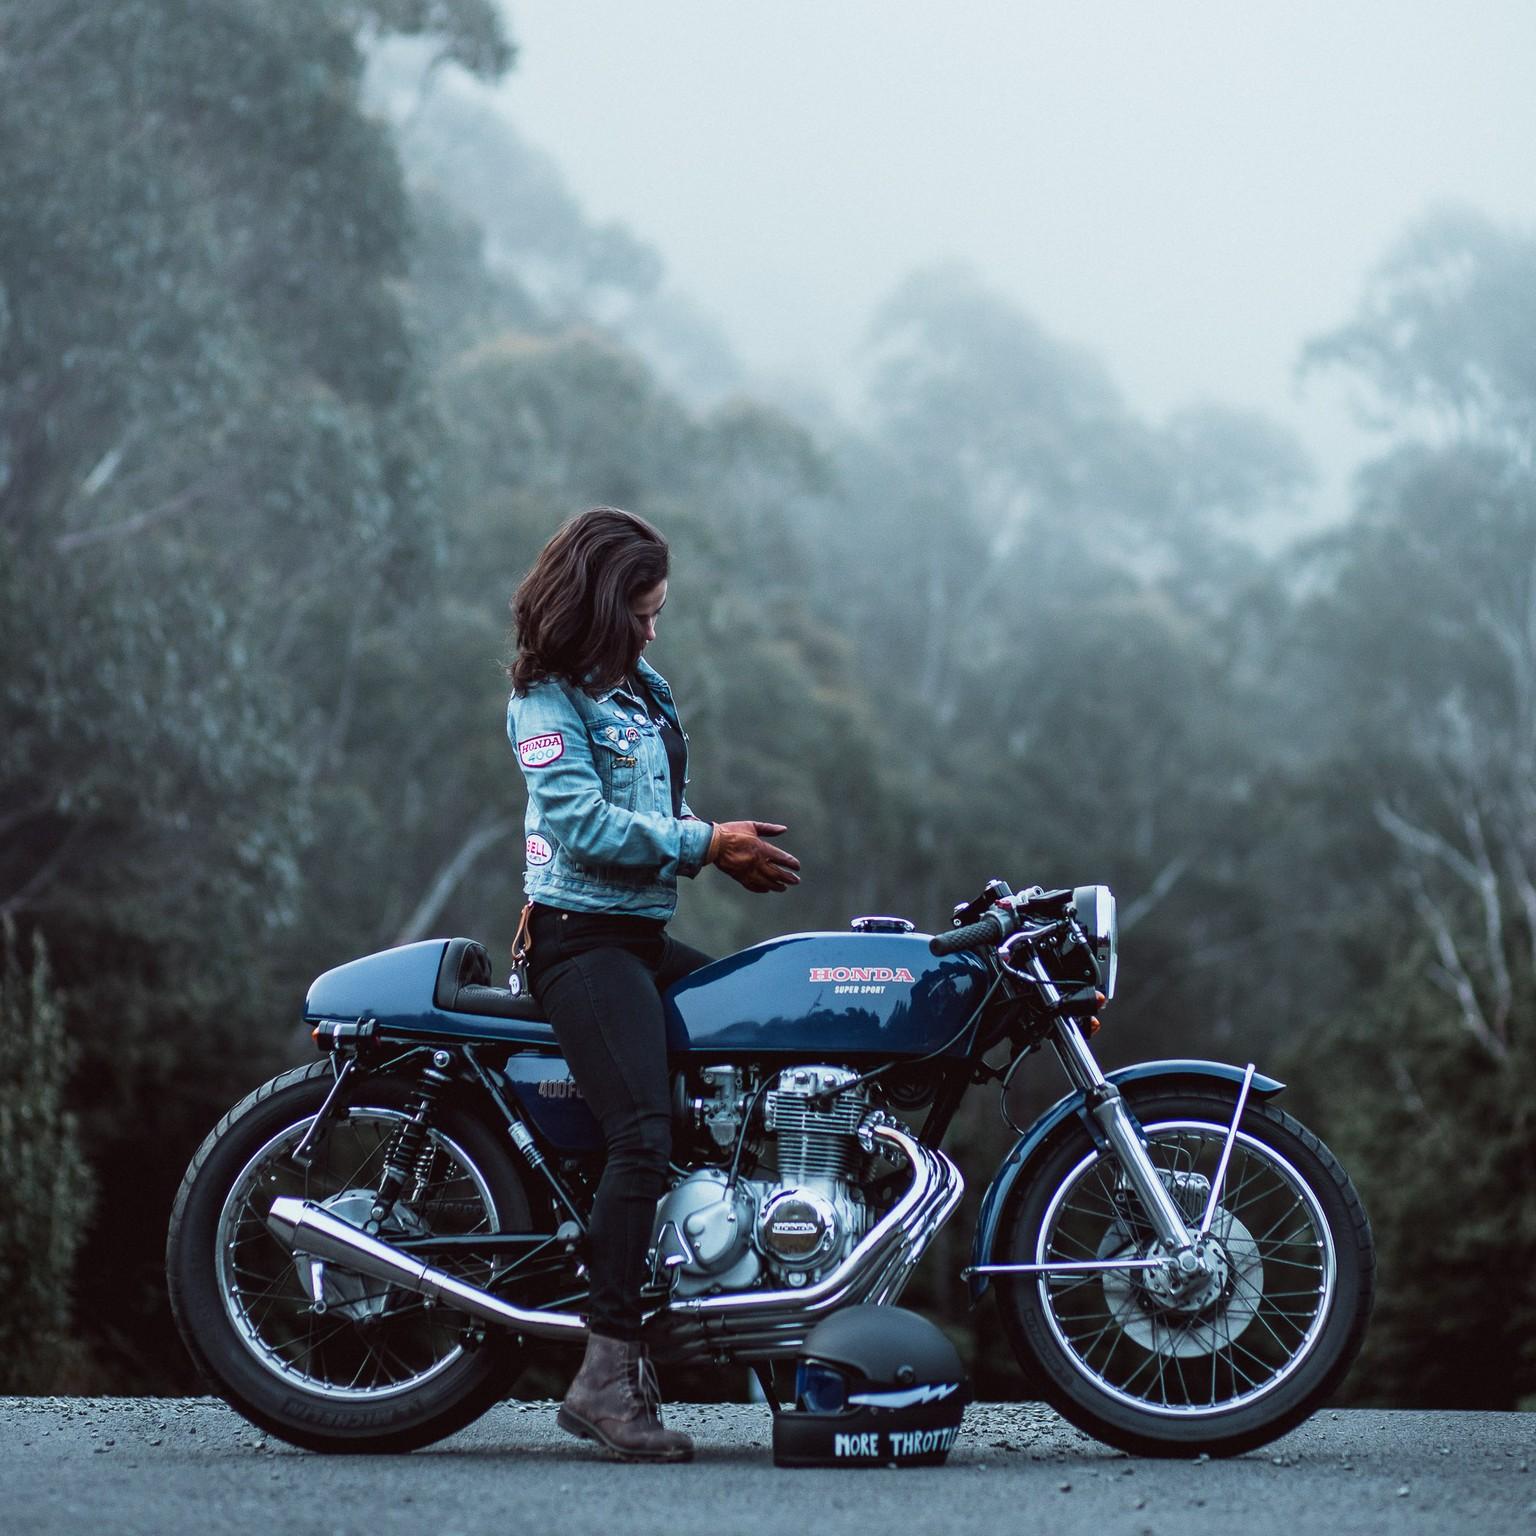 Woman on her 1976 Honda CB400F Motorcycle in Tasmania